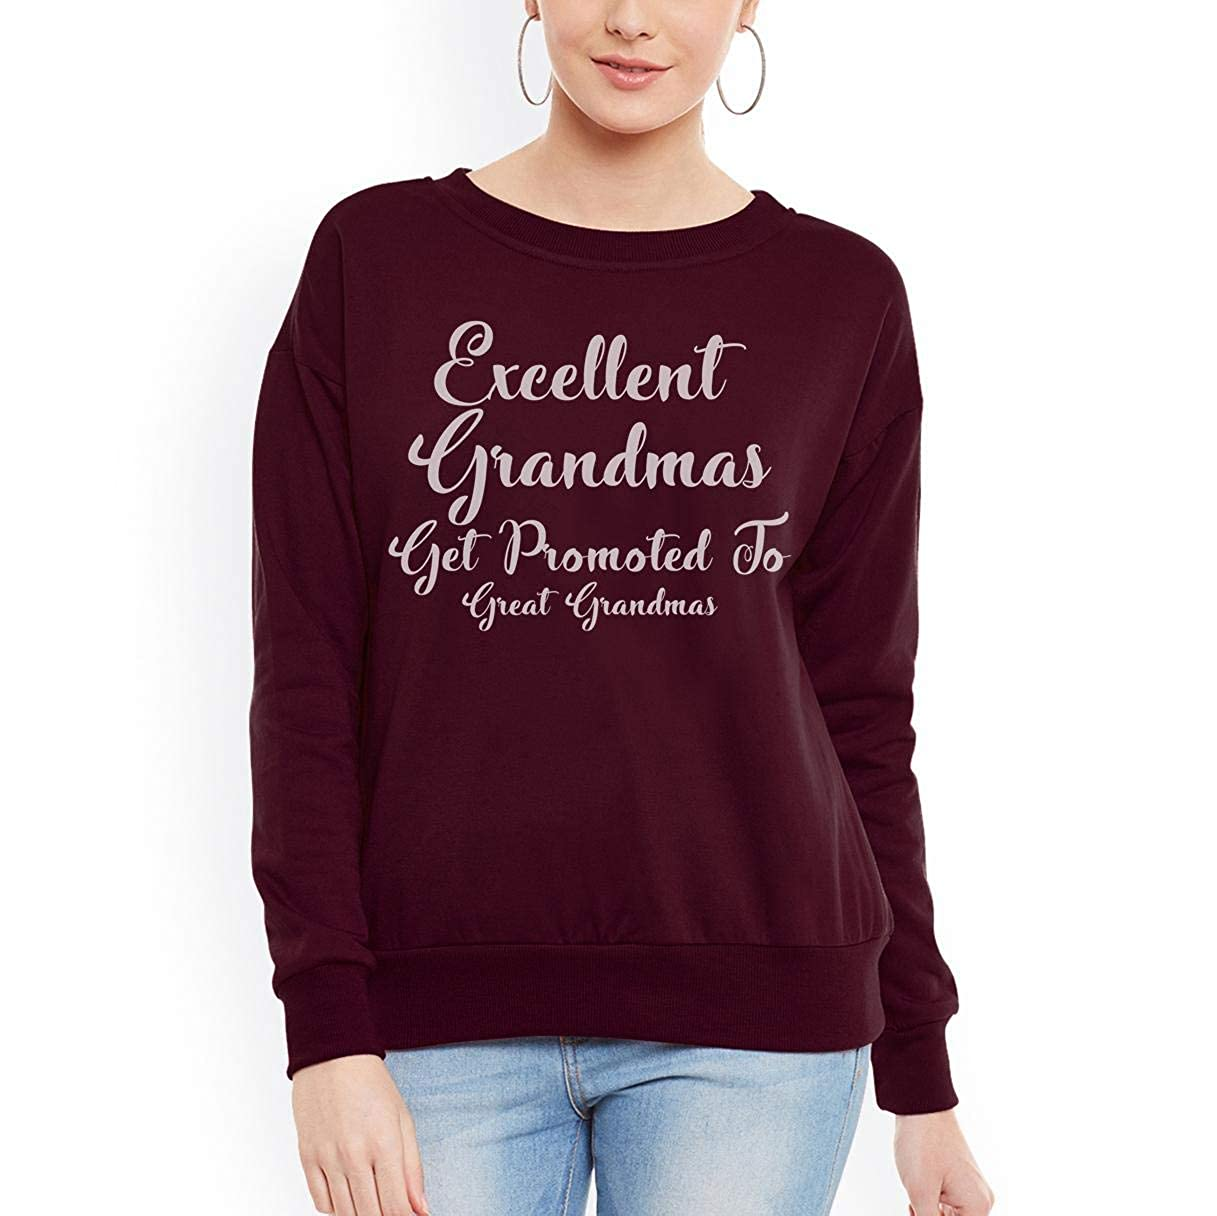 tee Doryti Excellent Grandmas Get Promoted to Great Grandmas Women Sweatshirt